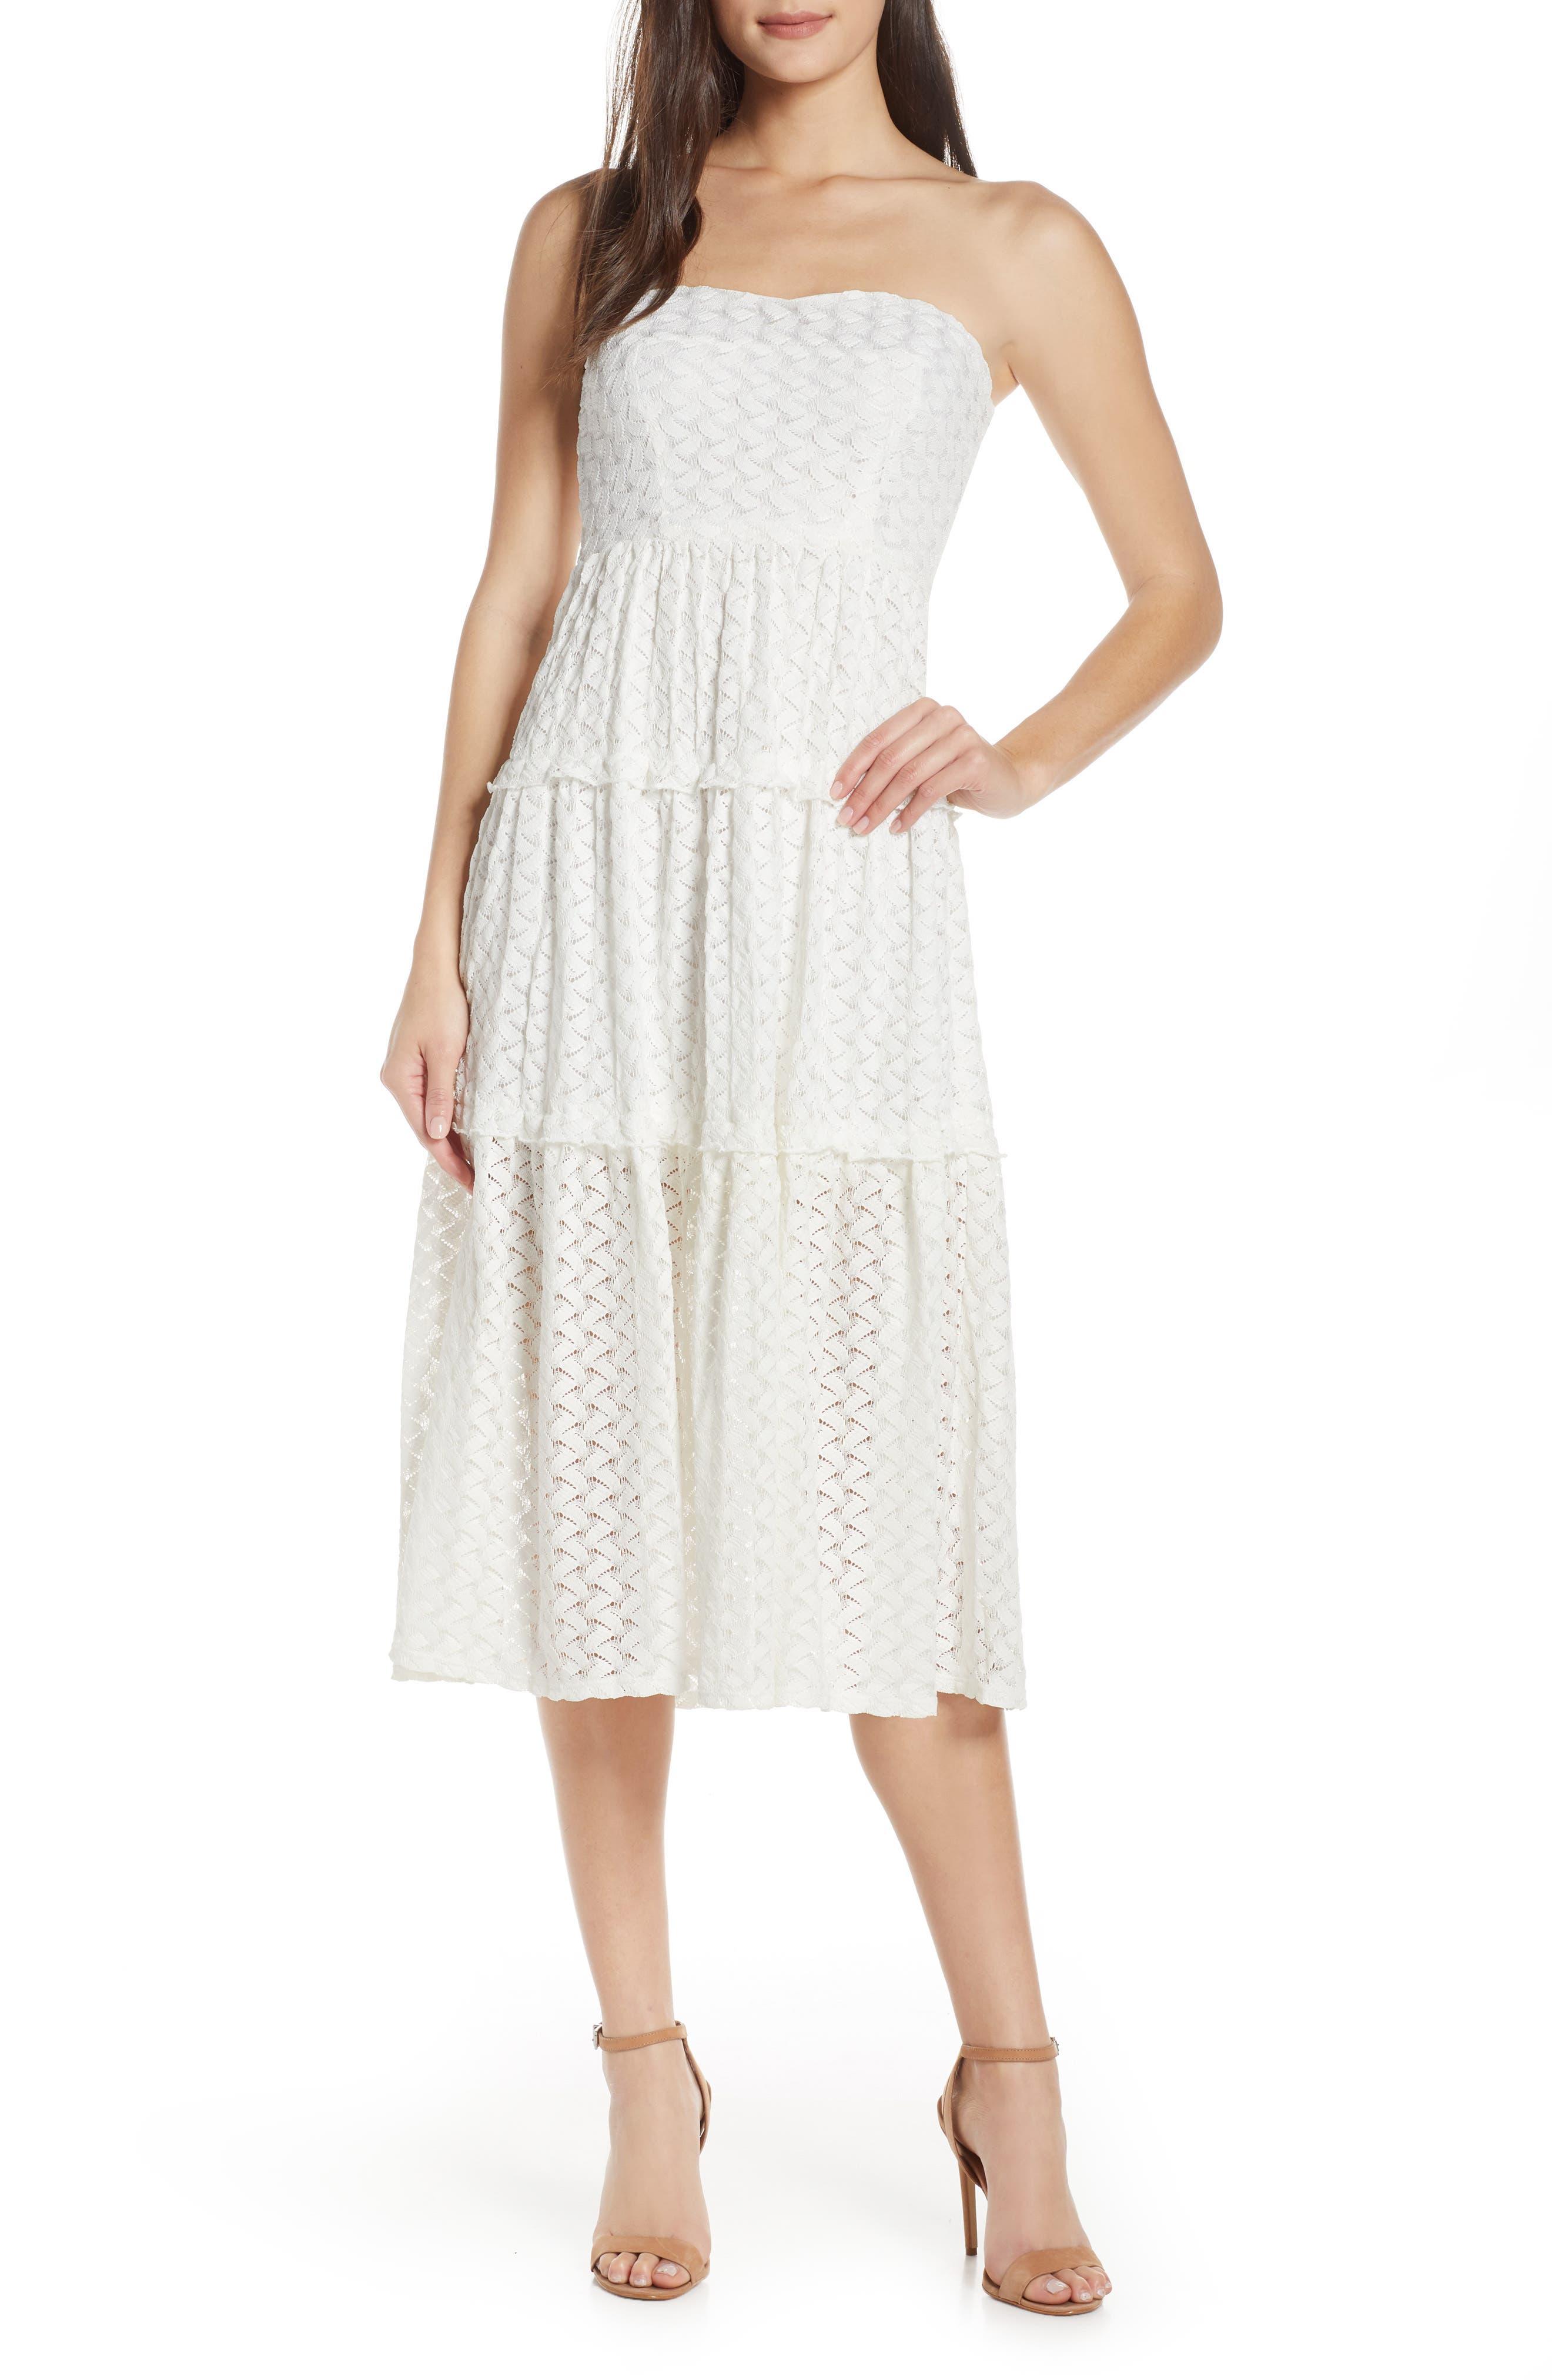 5f2f2587062c6 women's nsr strapless lace midi dress